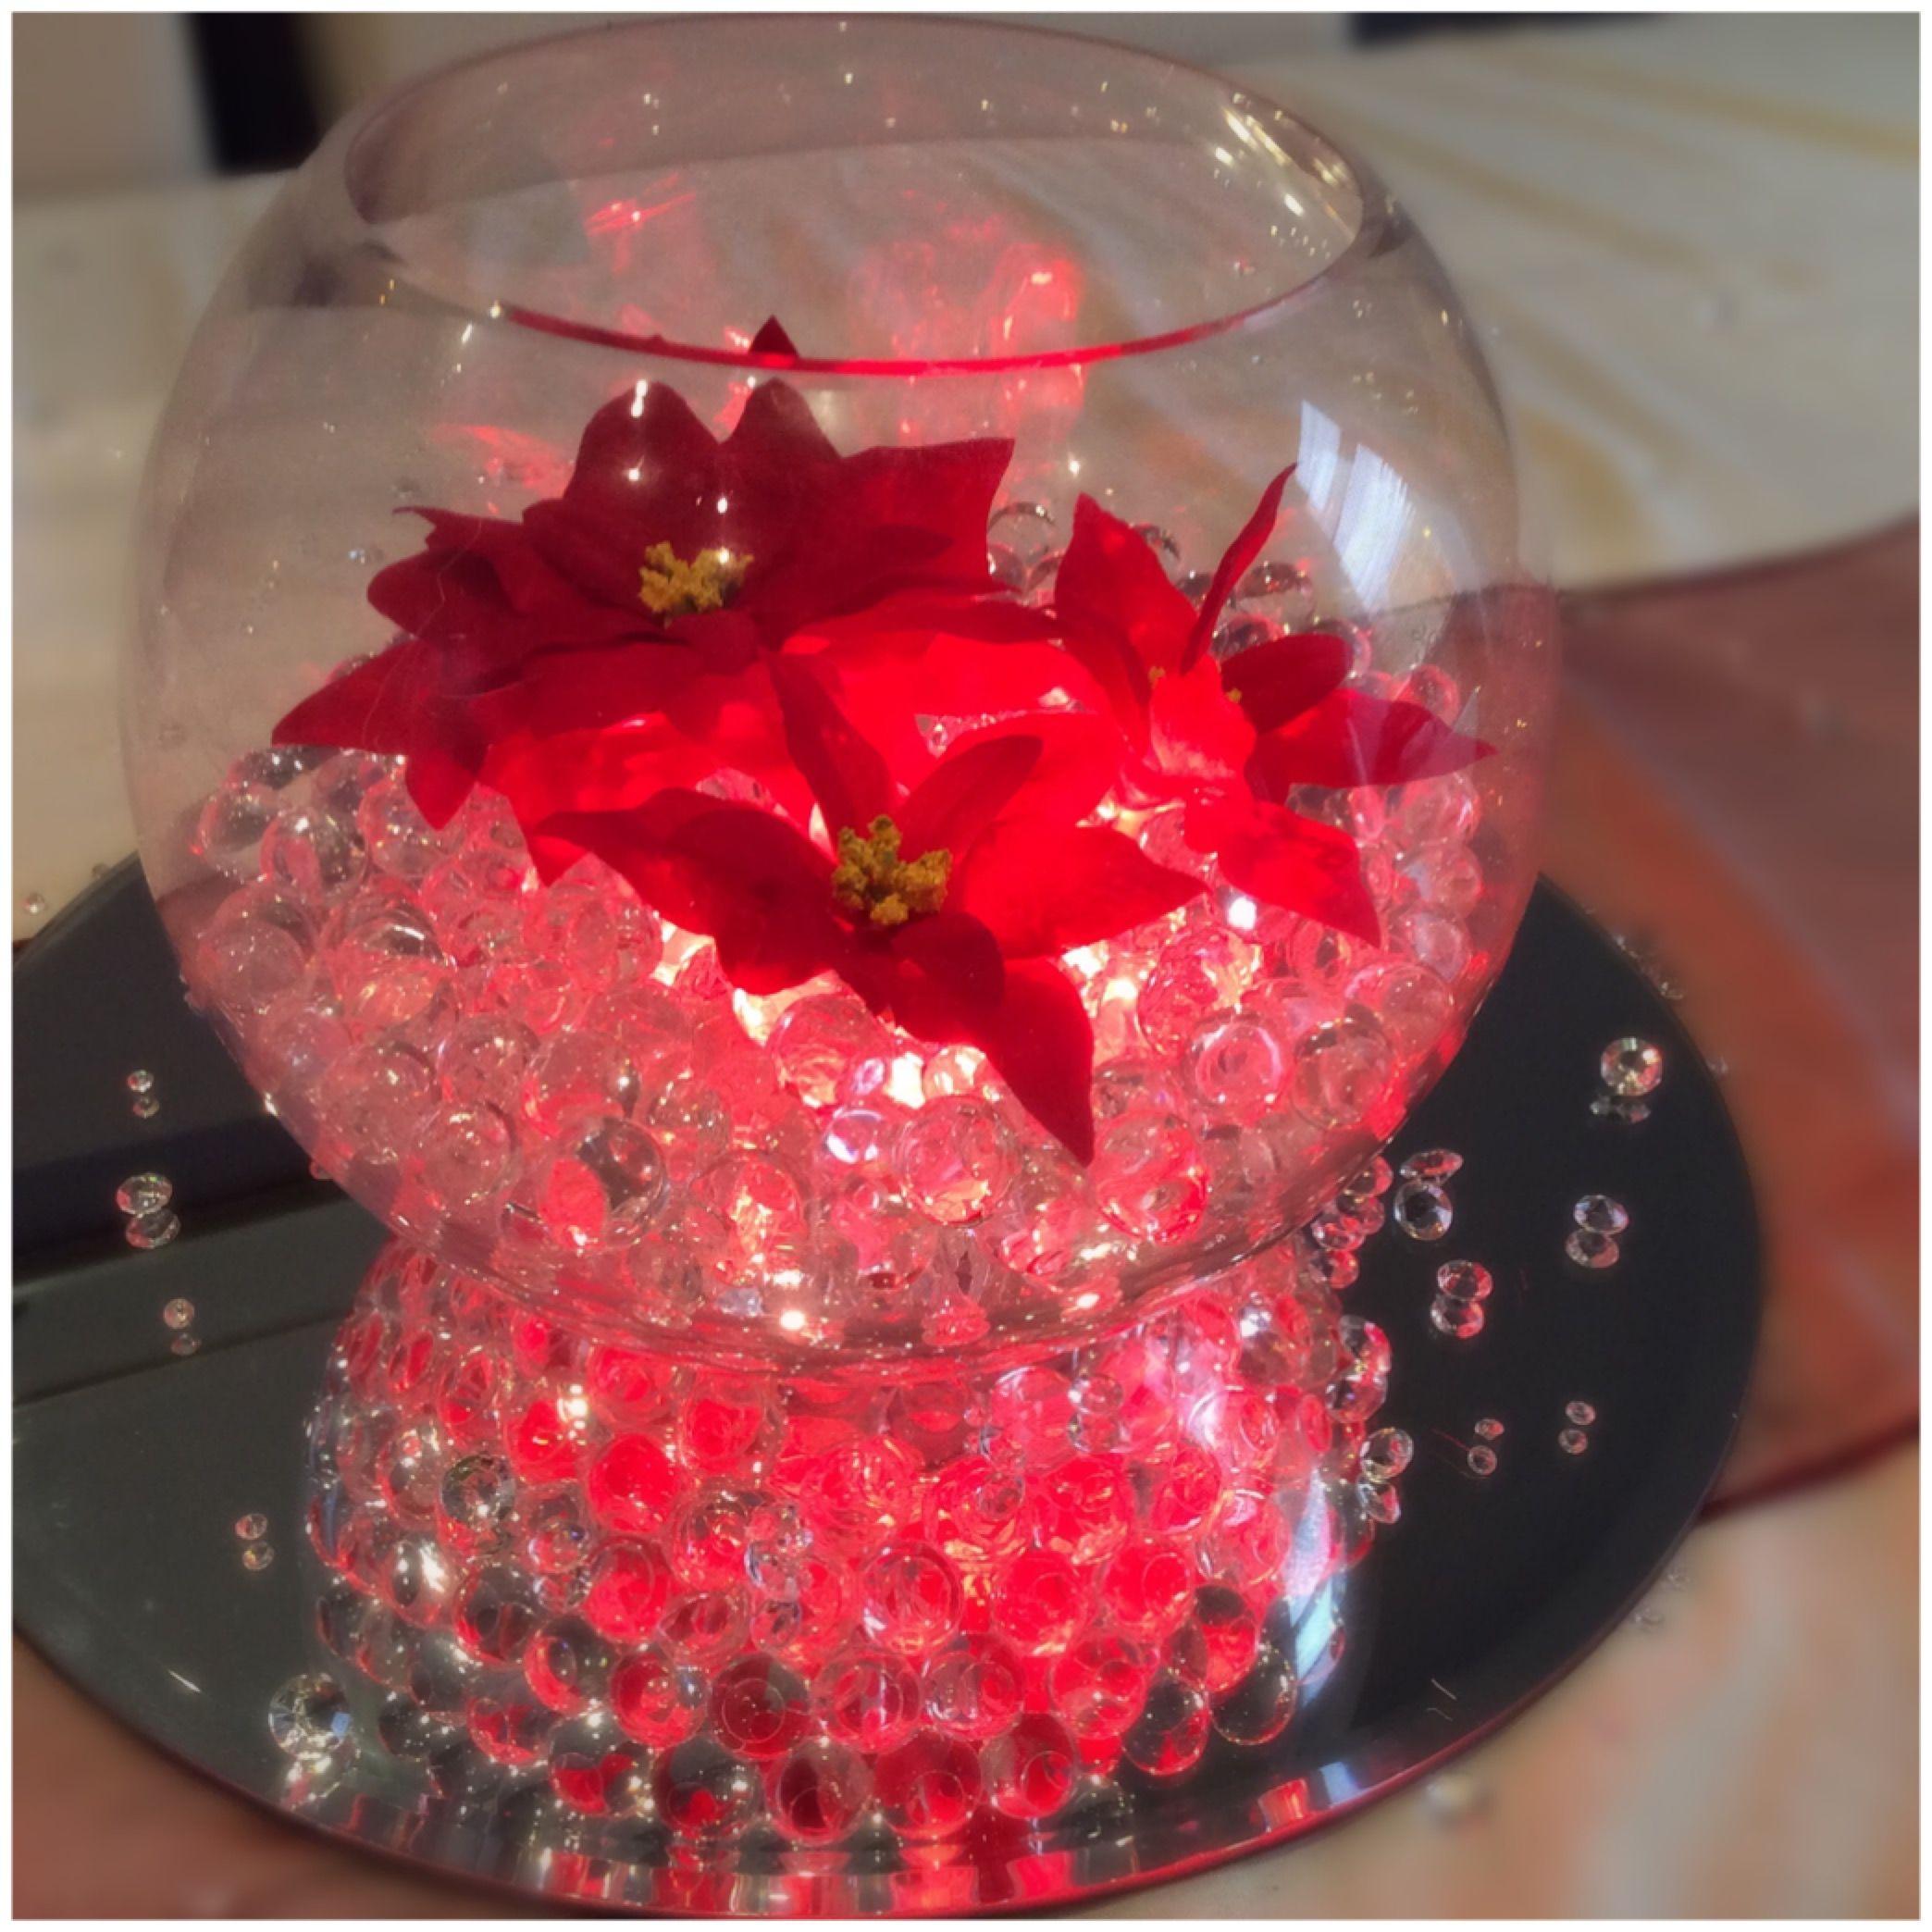 Fish Bowl Wedding Centrepiece Ideas: Fish Bowl Wedding Centrepiece For Christmas Themed